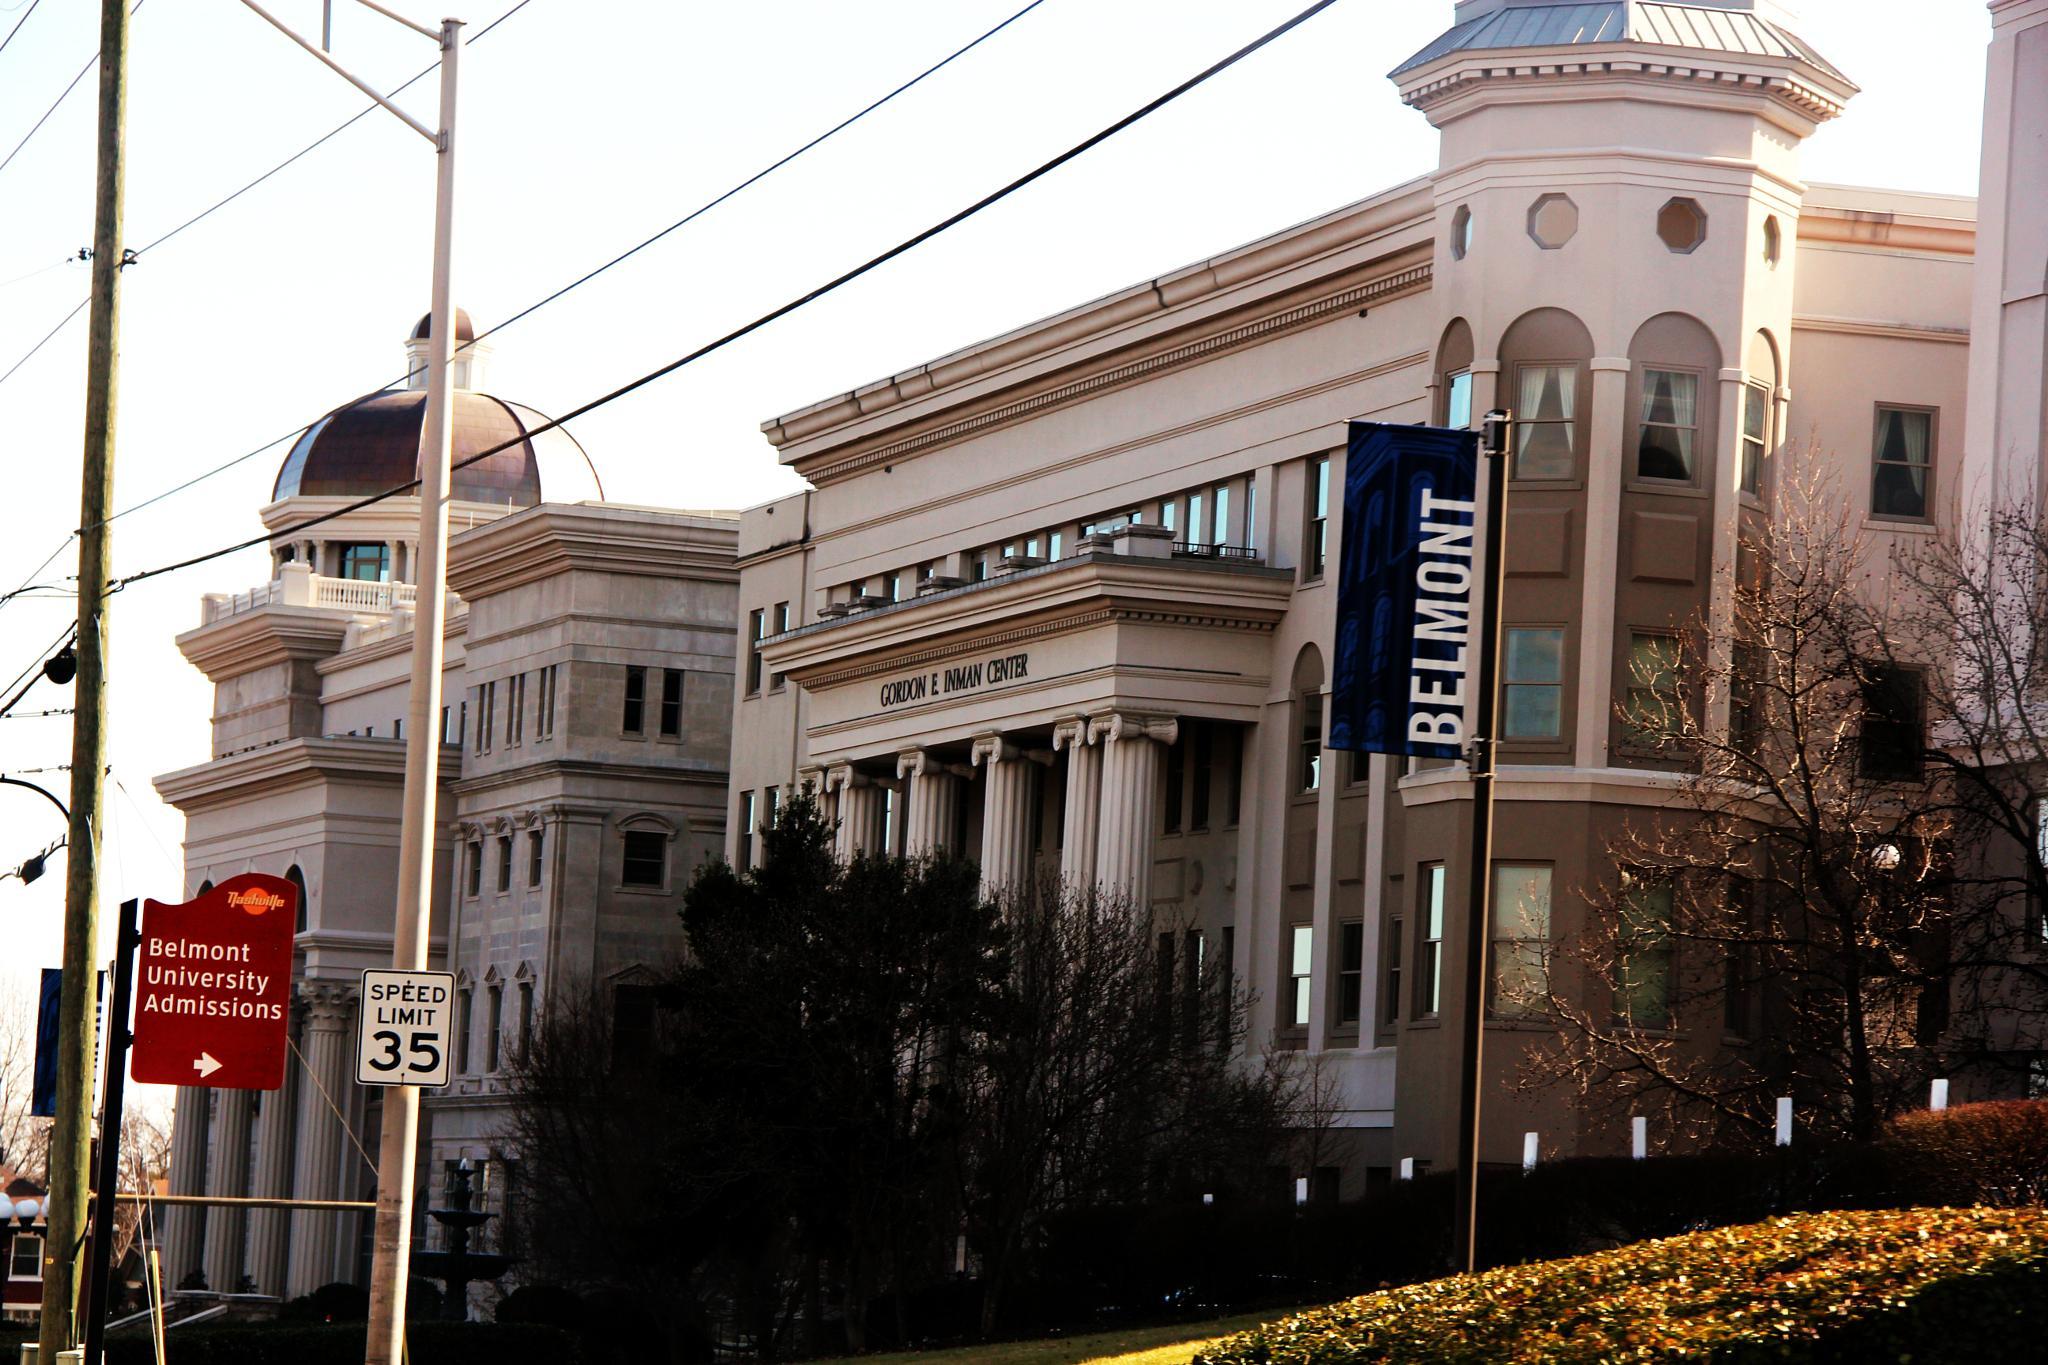 Gordon E. Inman Center by MsAnaGNz